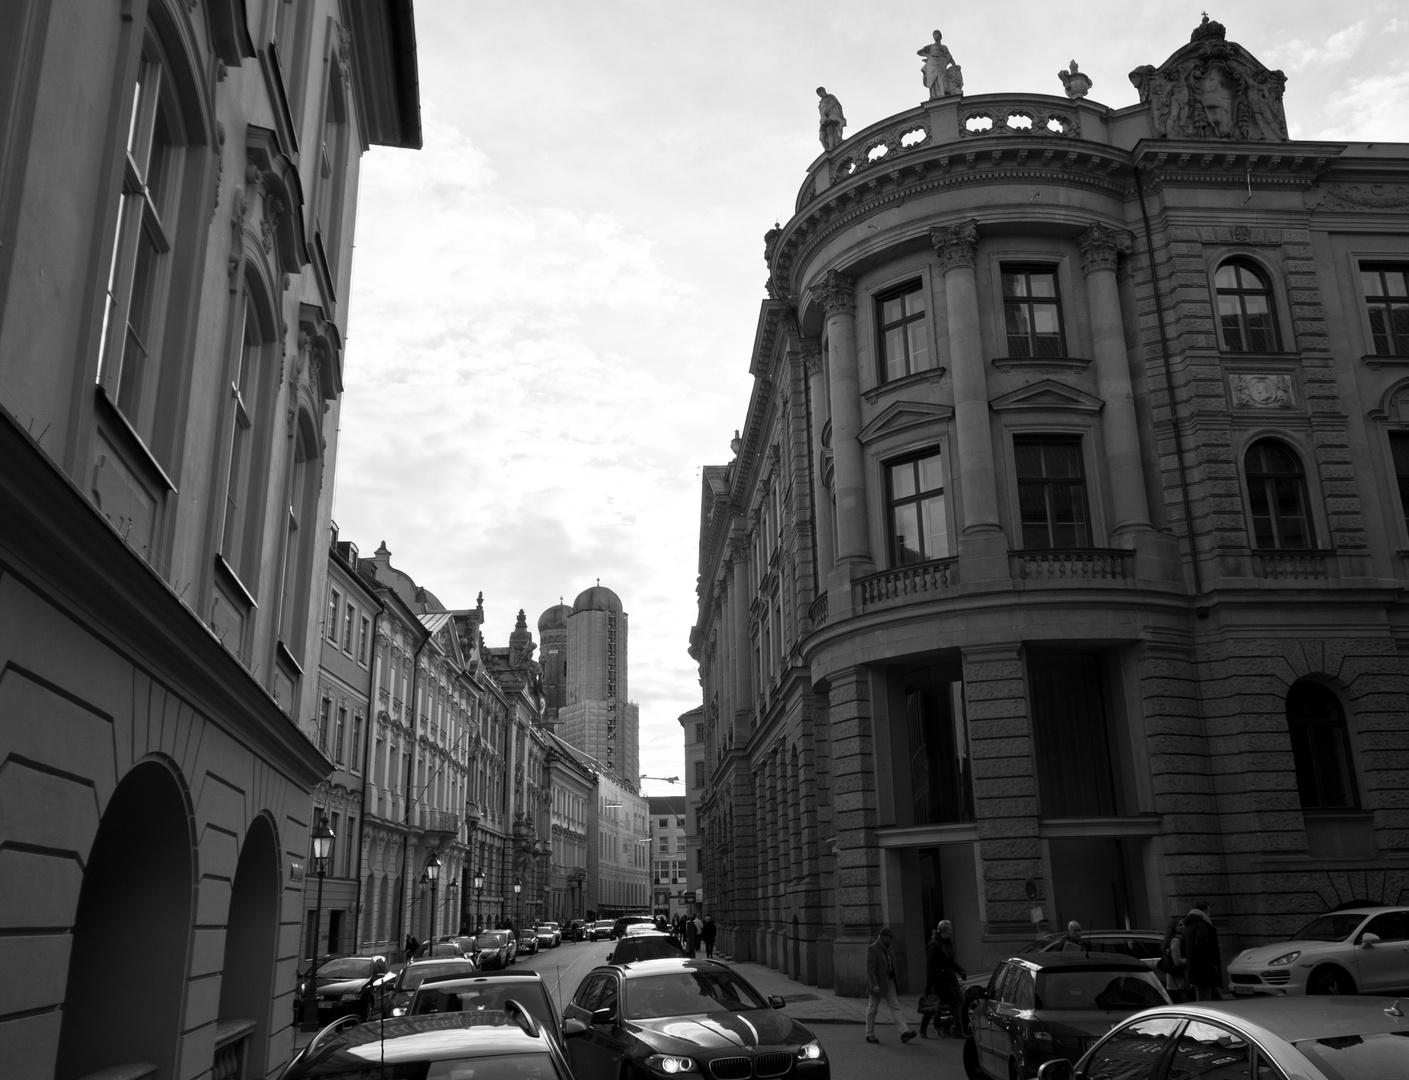 Die Kardinal-Faulhaber-Strasse